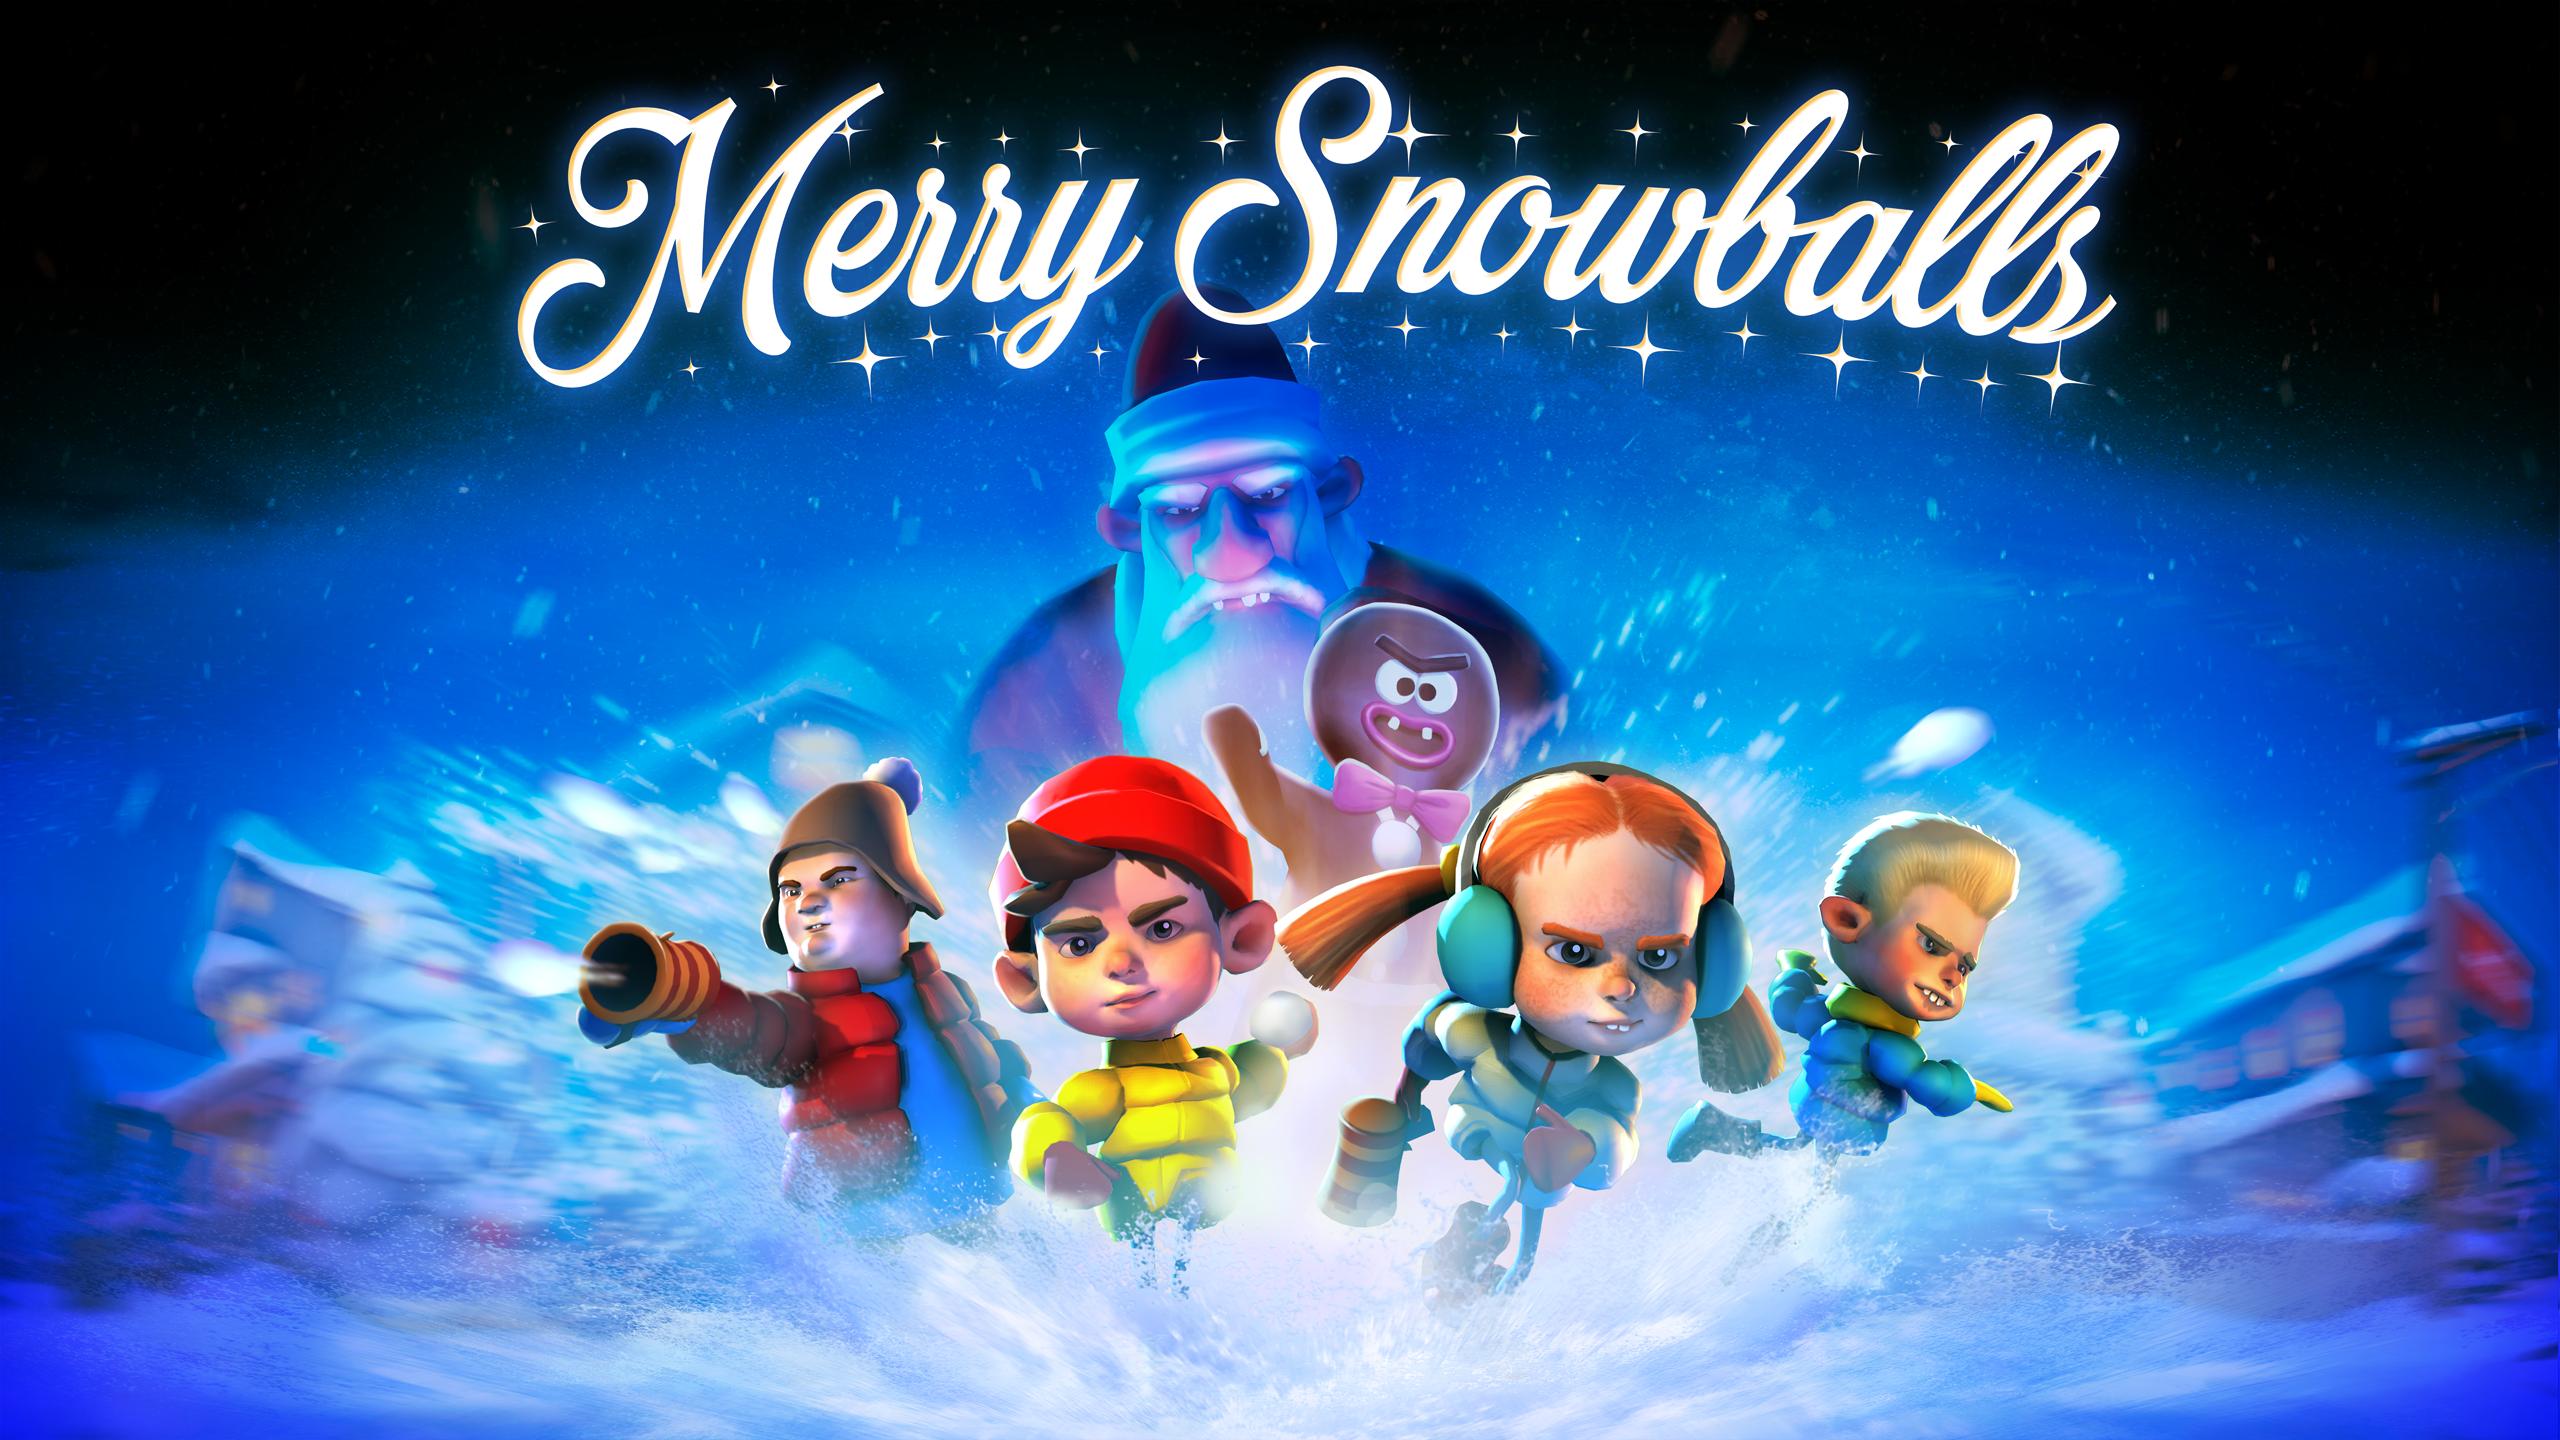 Six platforms, three months: bringing Merry Snowballs to mobile VR